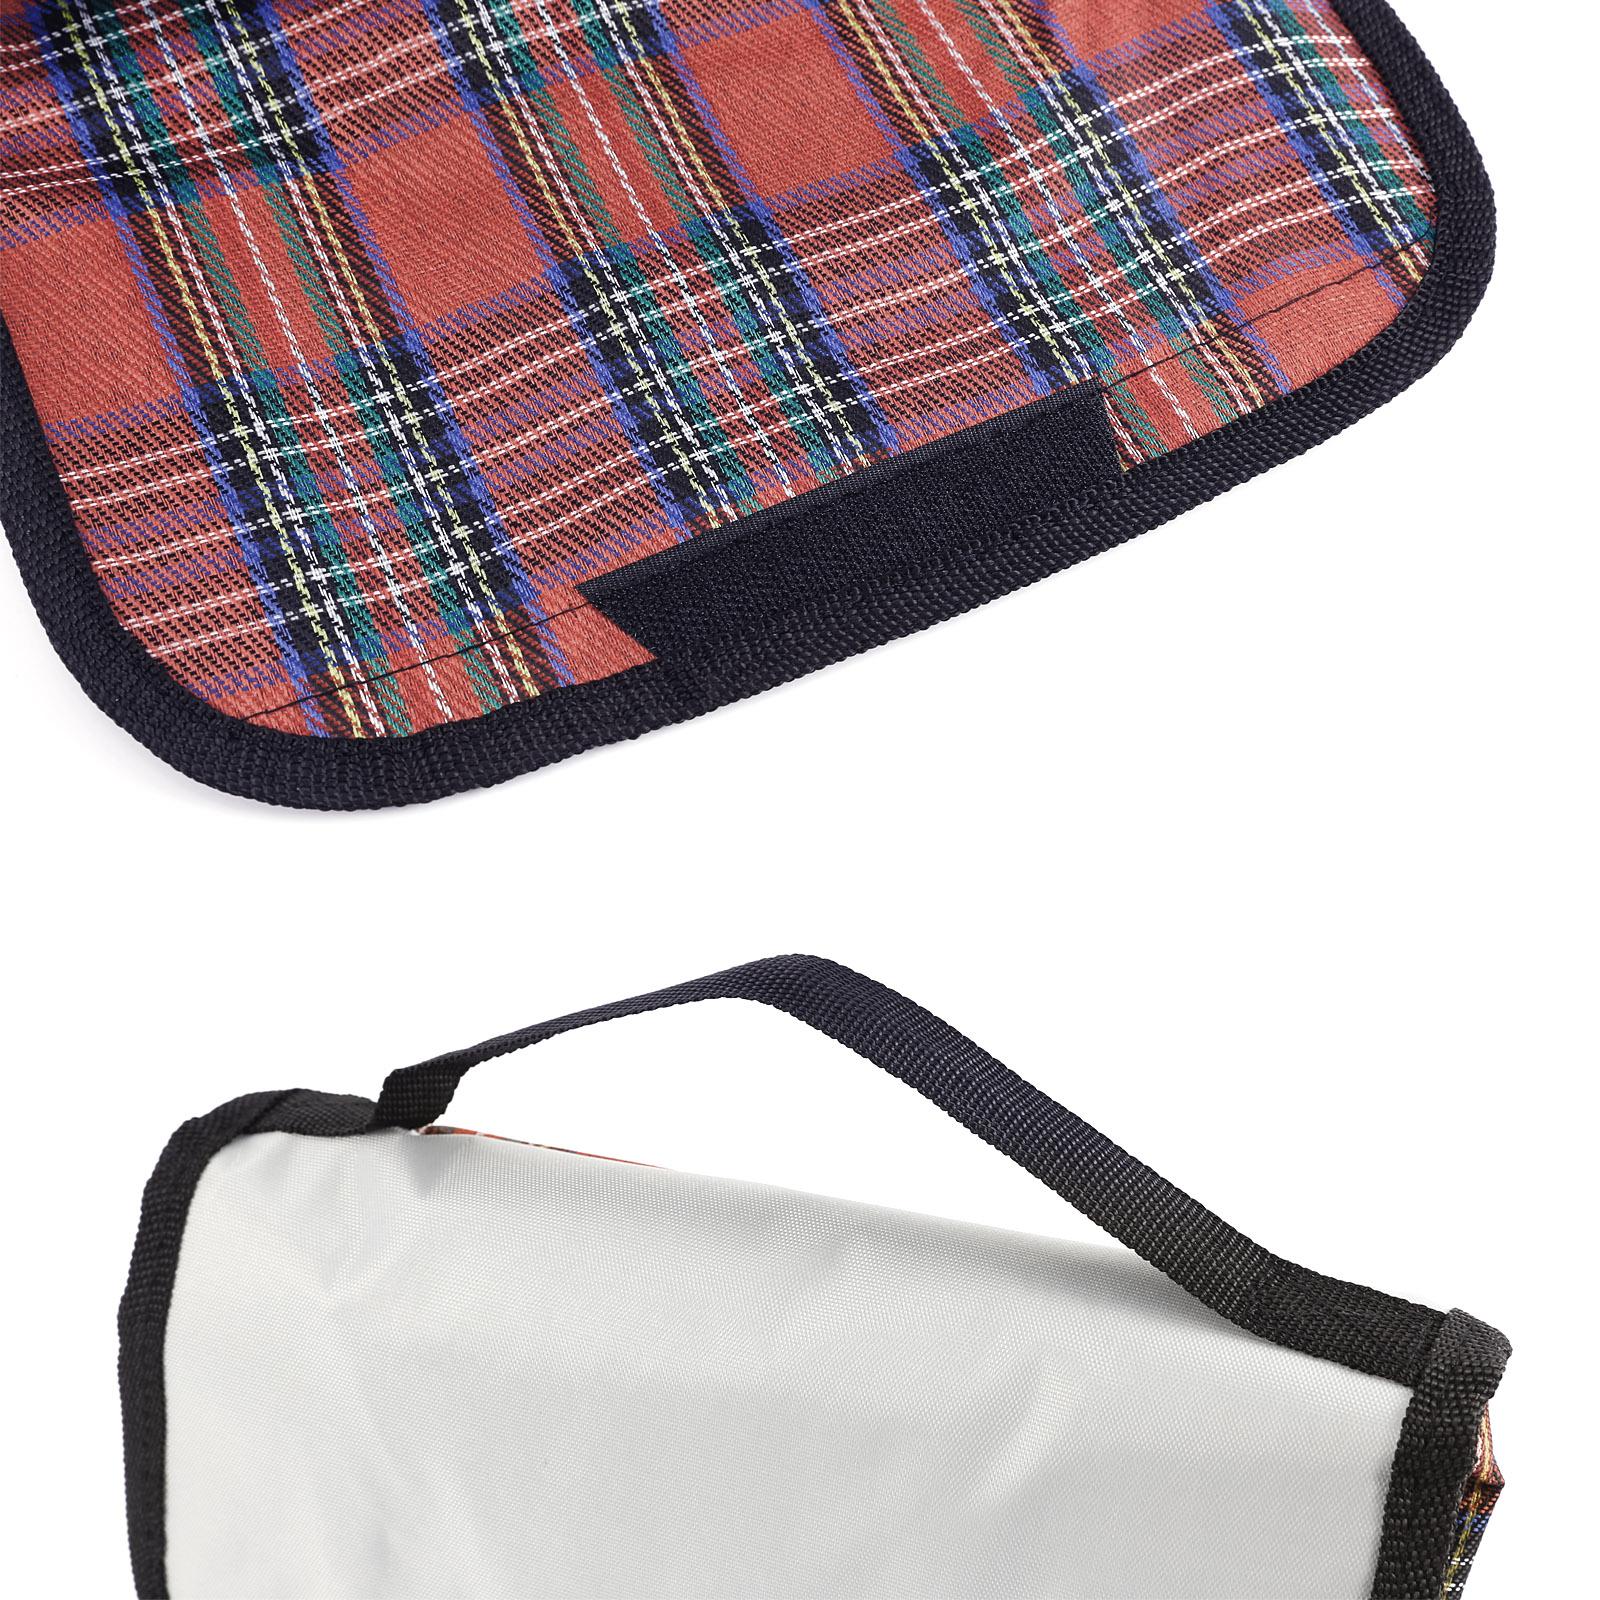 Large waterproof picnic mat blanket rug travel outdoor for Au maison picnic blanket